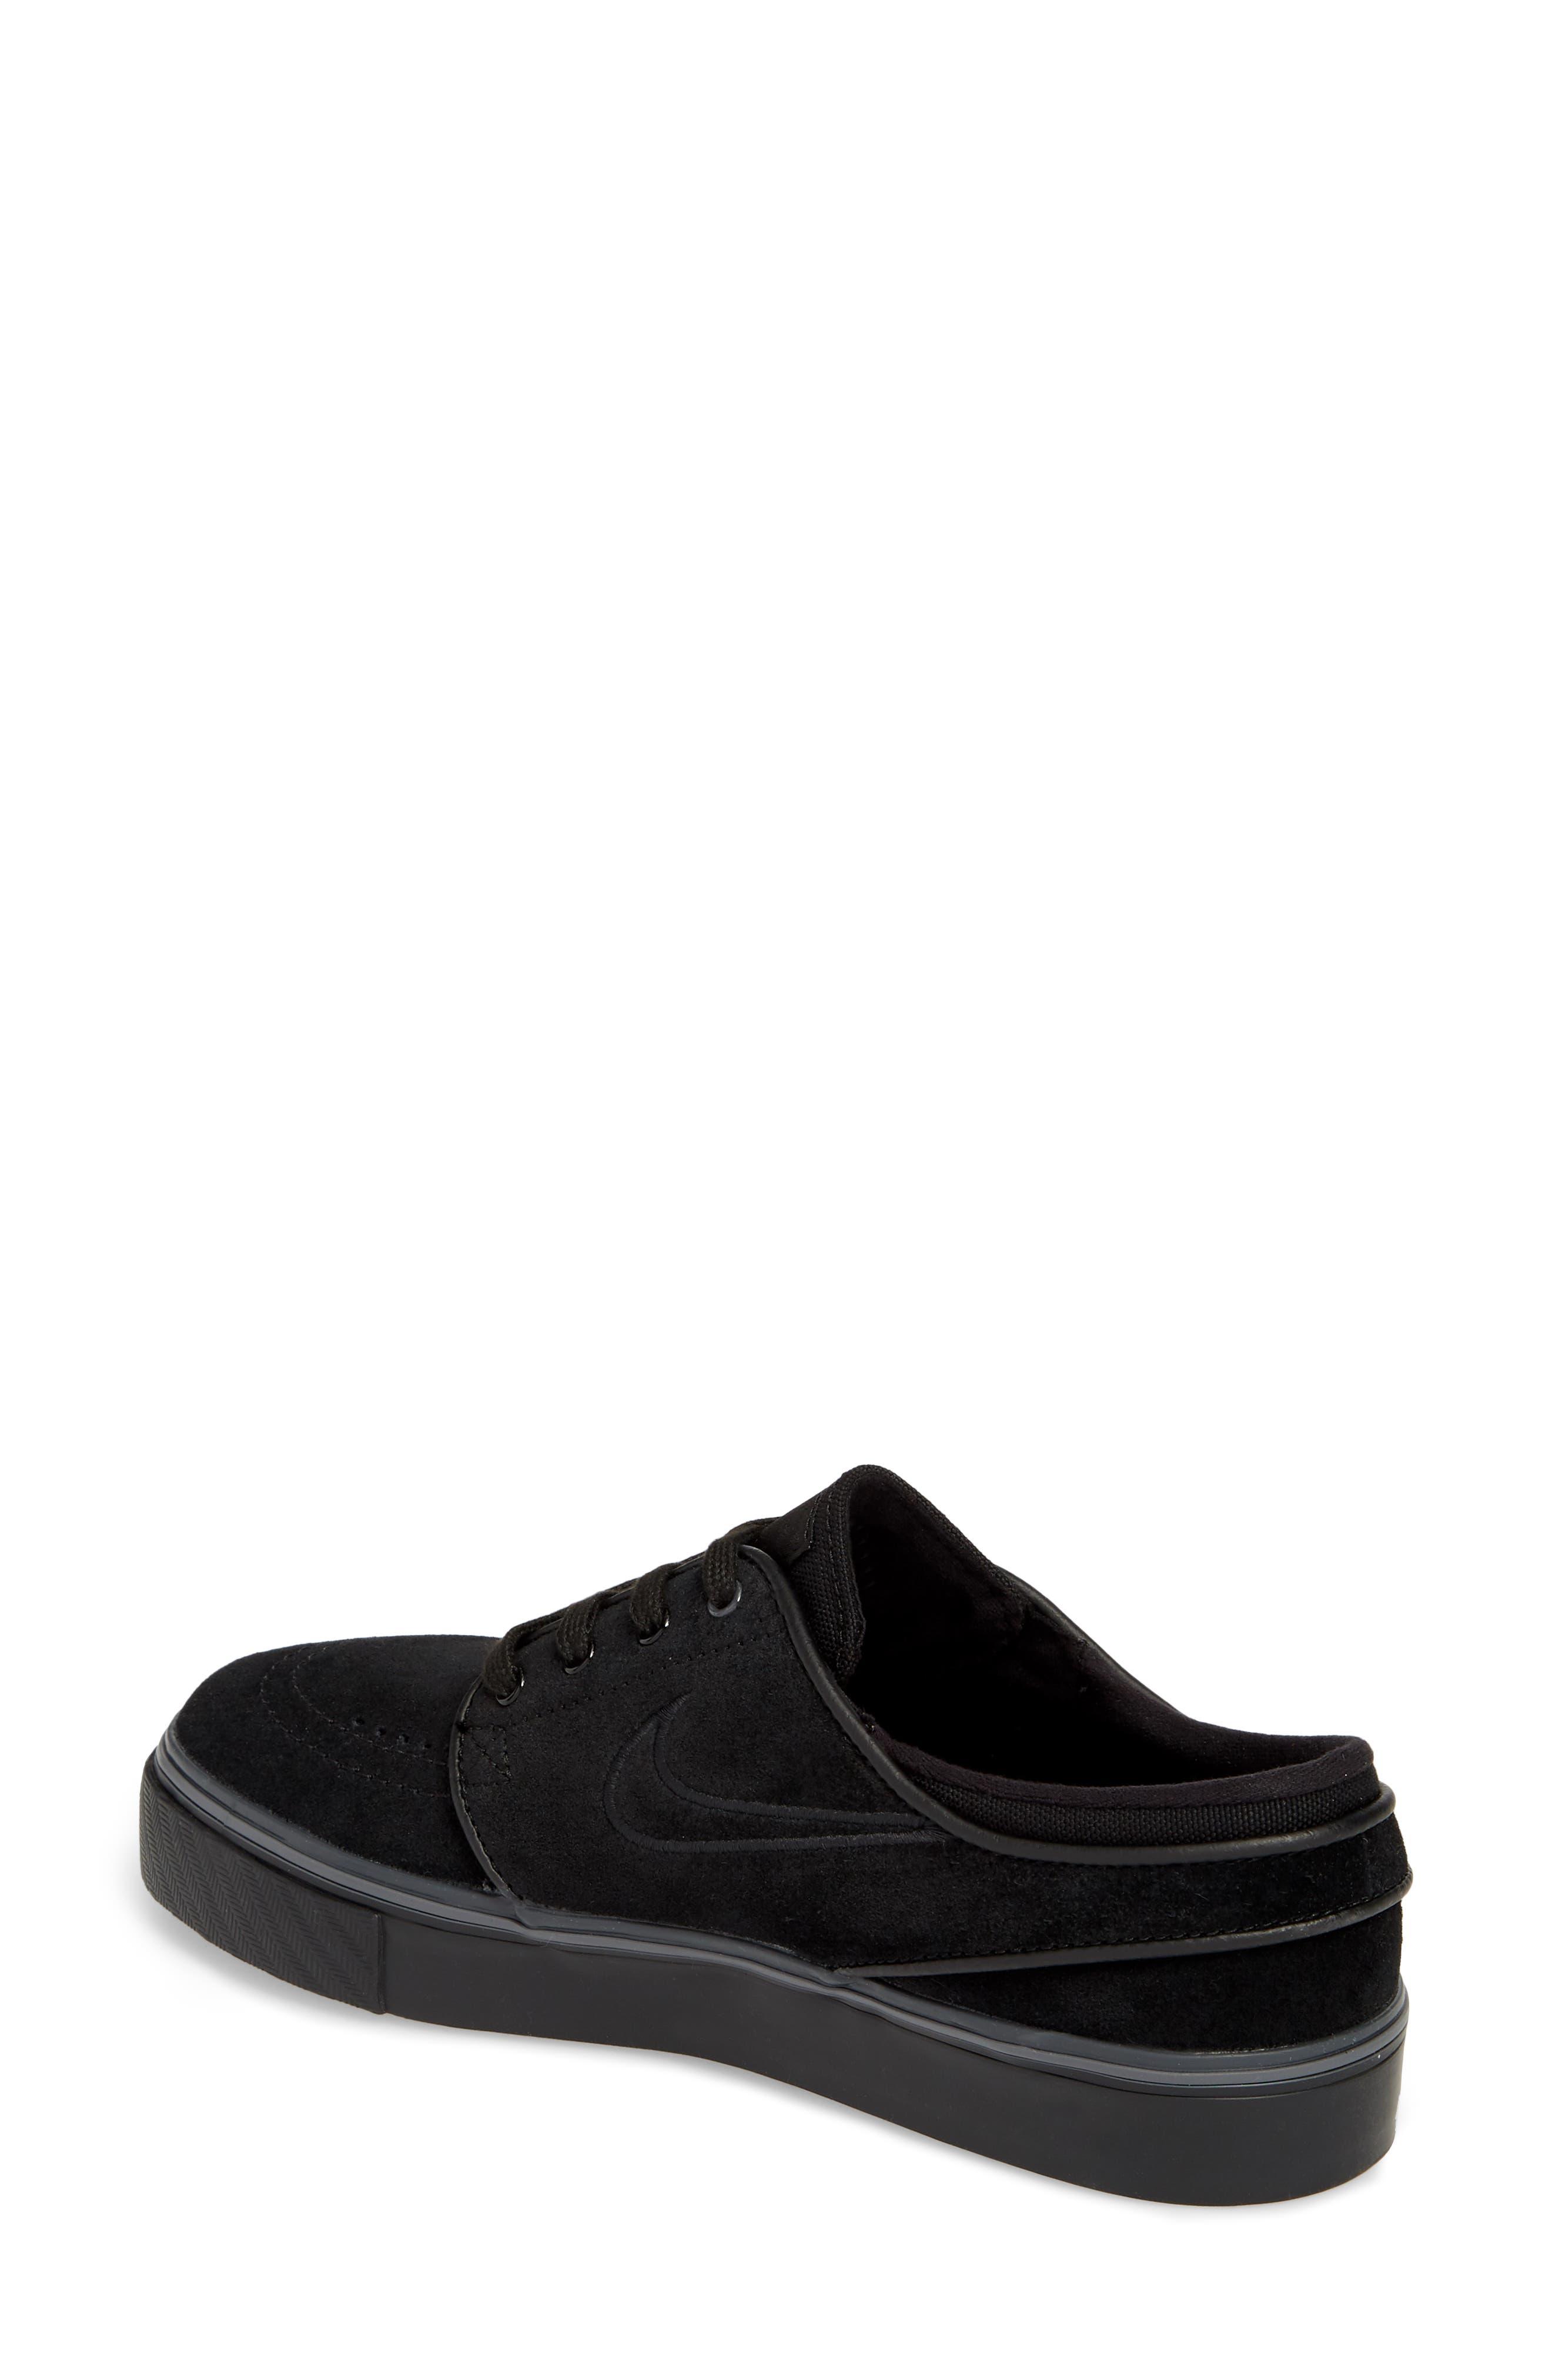 SB Air Zoom Stefan Janoski Skate Sneaker,                             Alternate thumbnail 2, color,                             BLACK/ BLACK/ BLACK